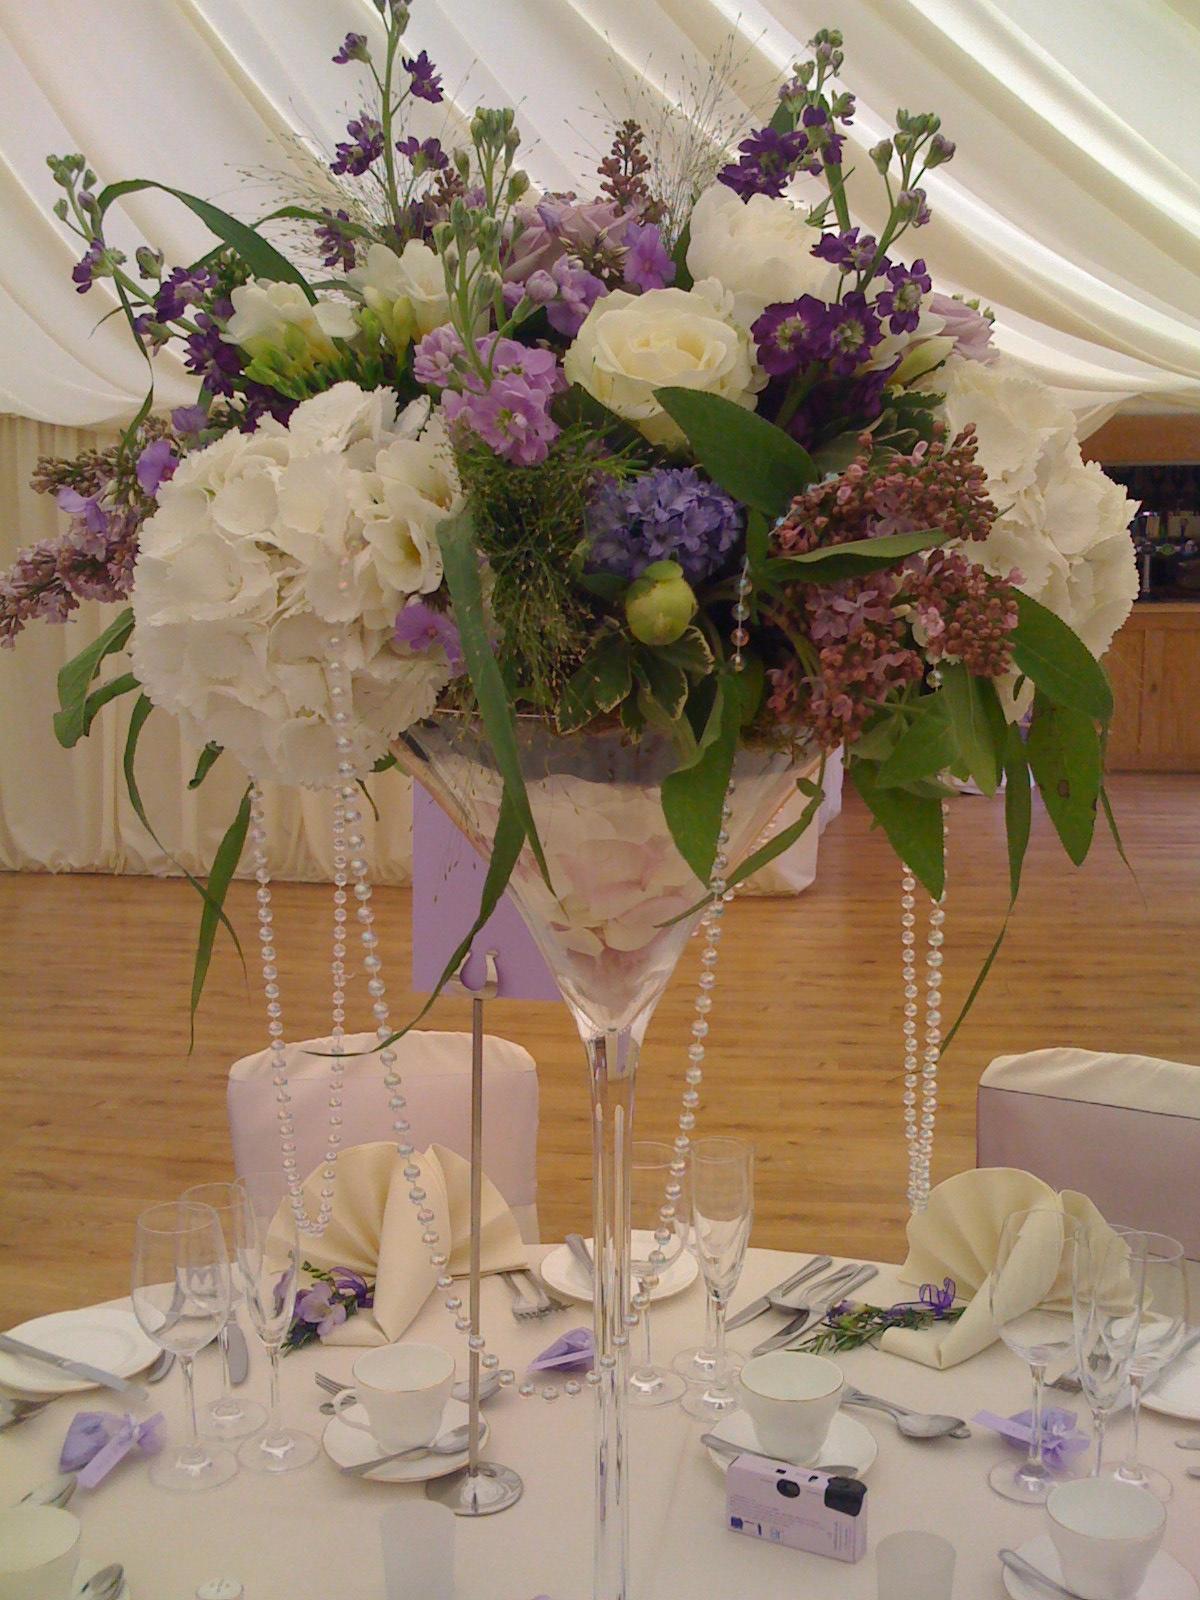 Martini Glass Vase - Flowerstouch